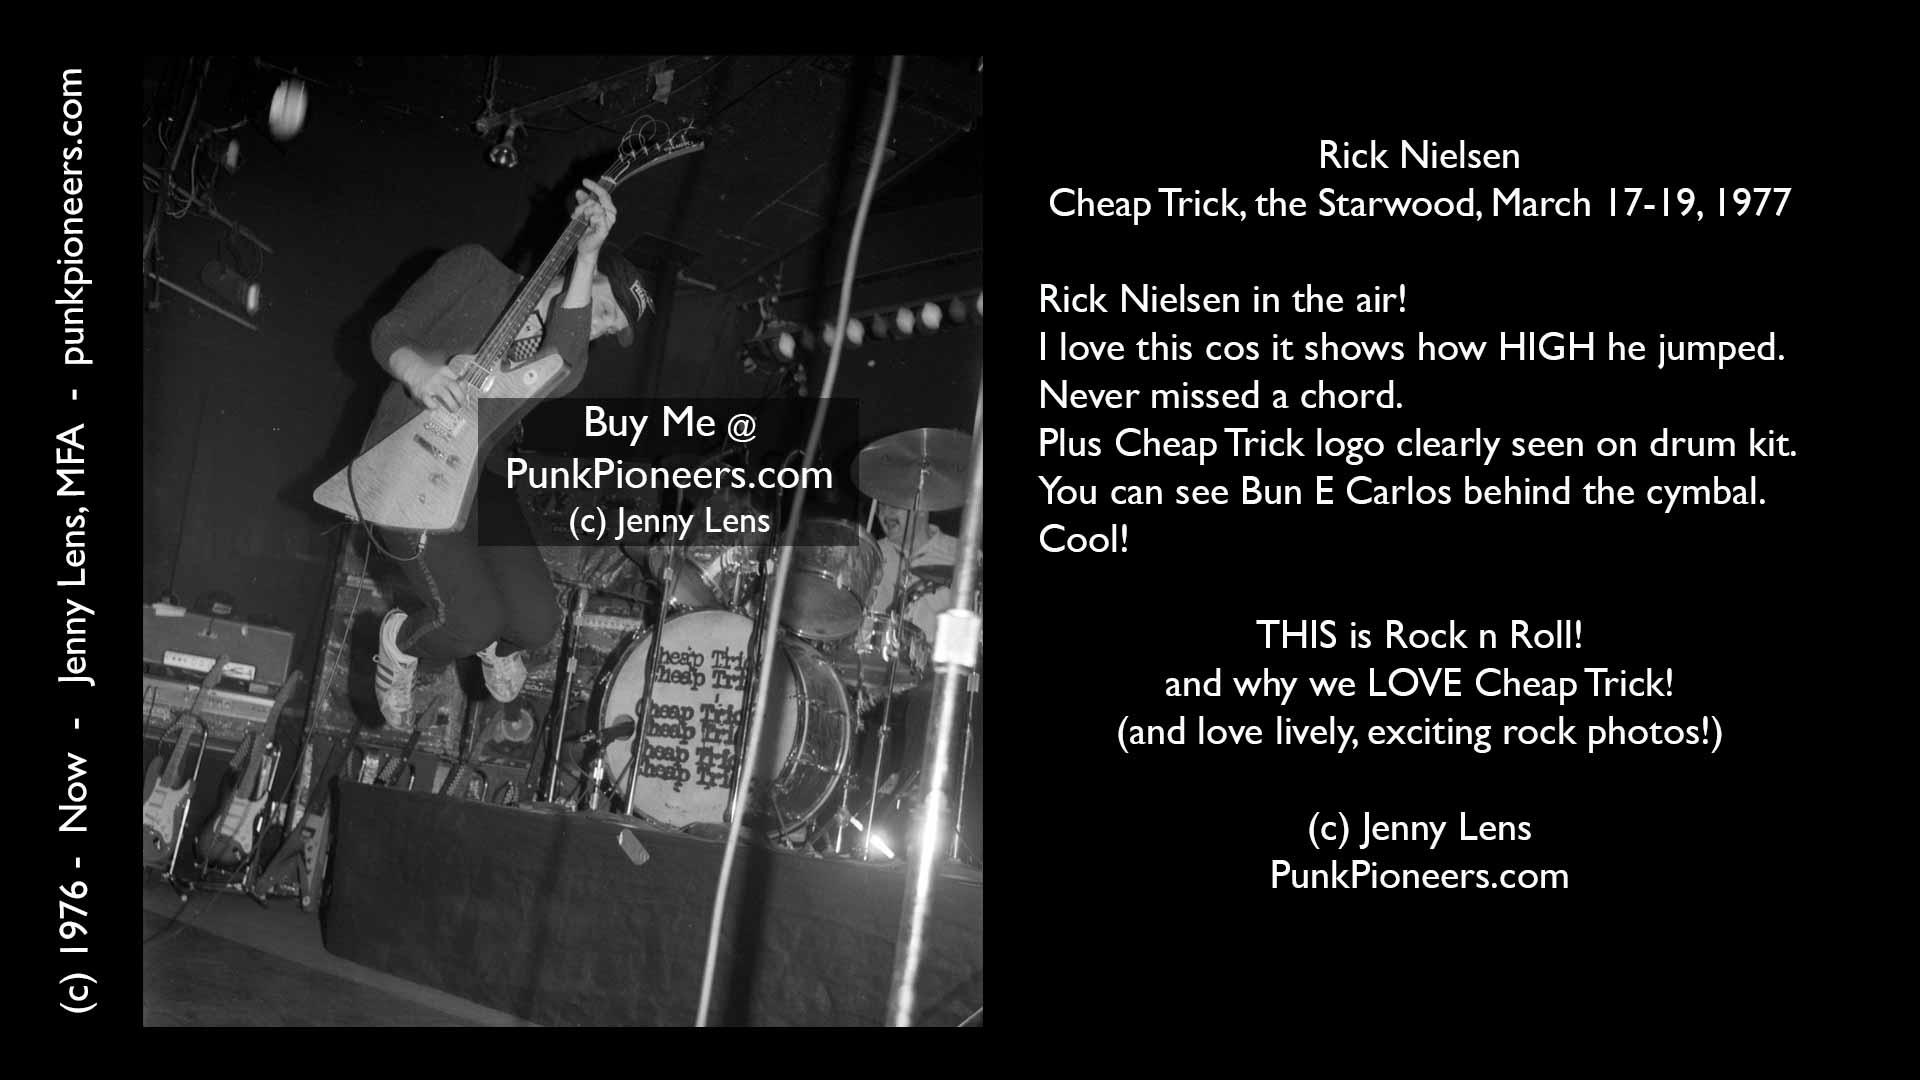 Cheap Trick, Rick Nielsen, Starwood, March 1977, Jenny Lens, PunkPioneers.com